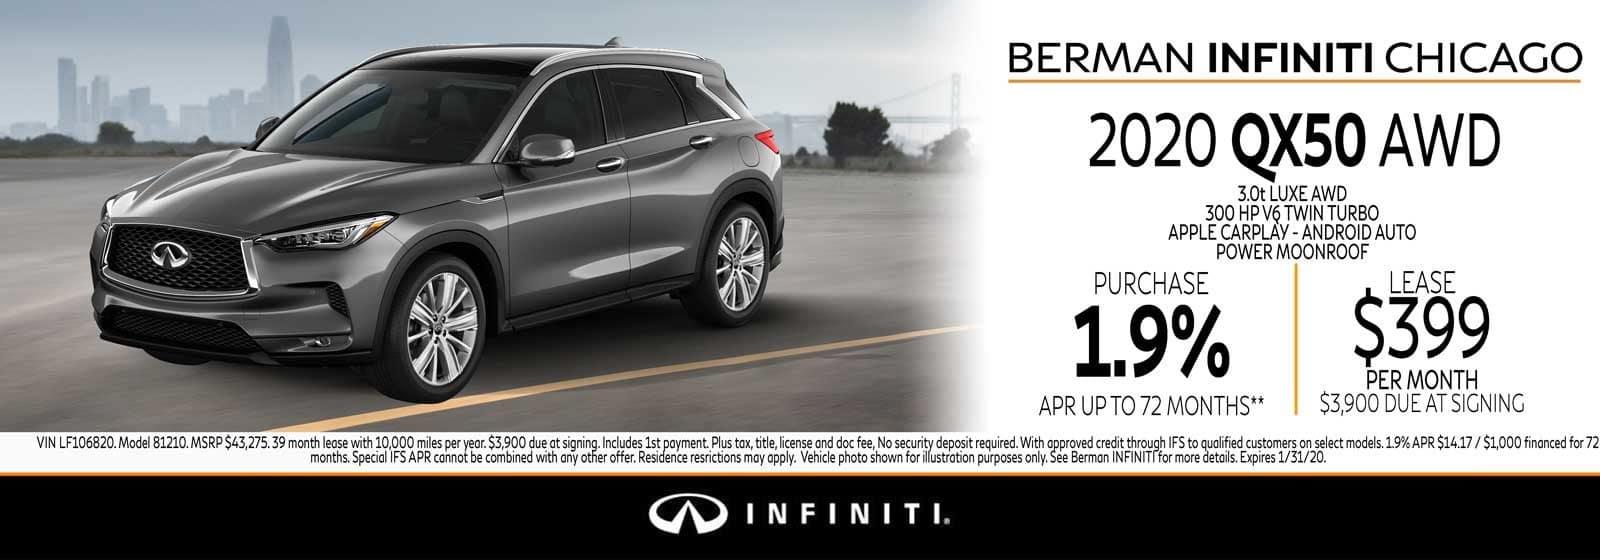 New 2020 INFINITI QX50 January offer at Berman INFINITI Chicago!